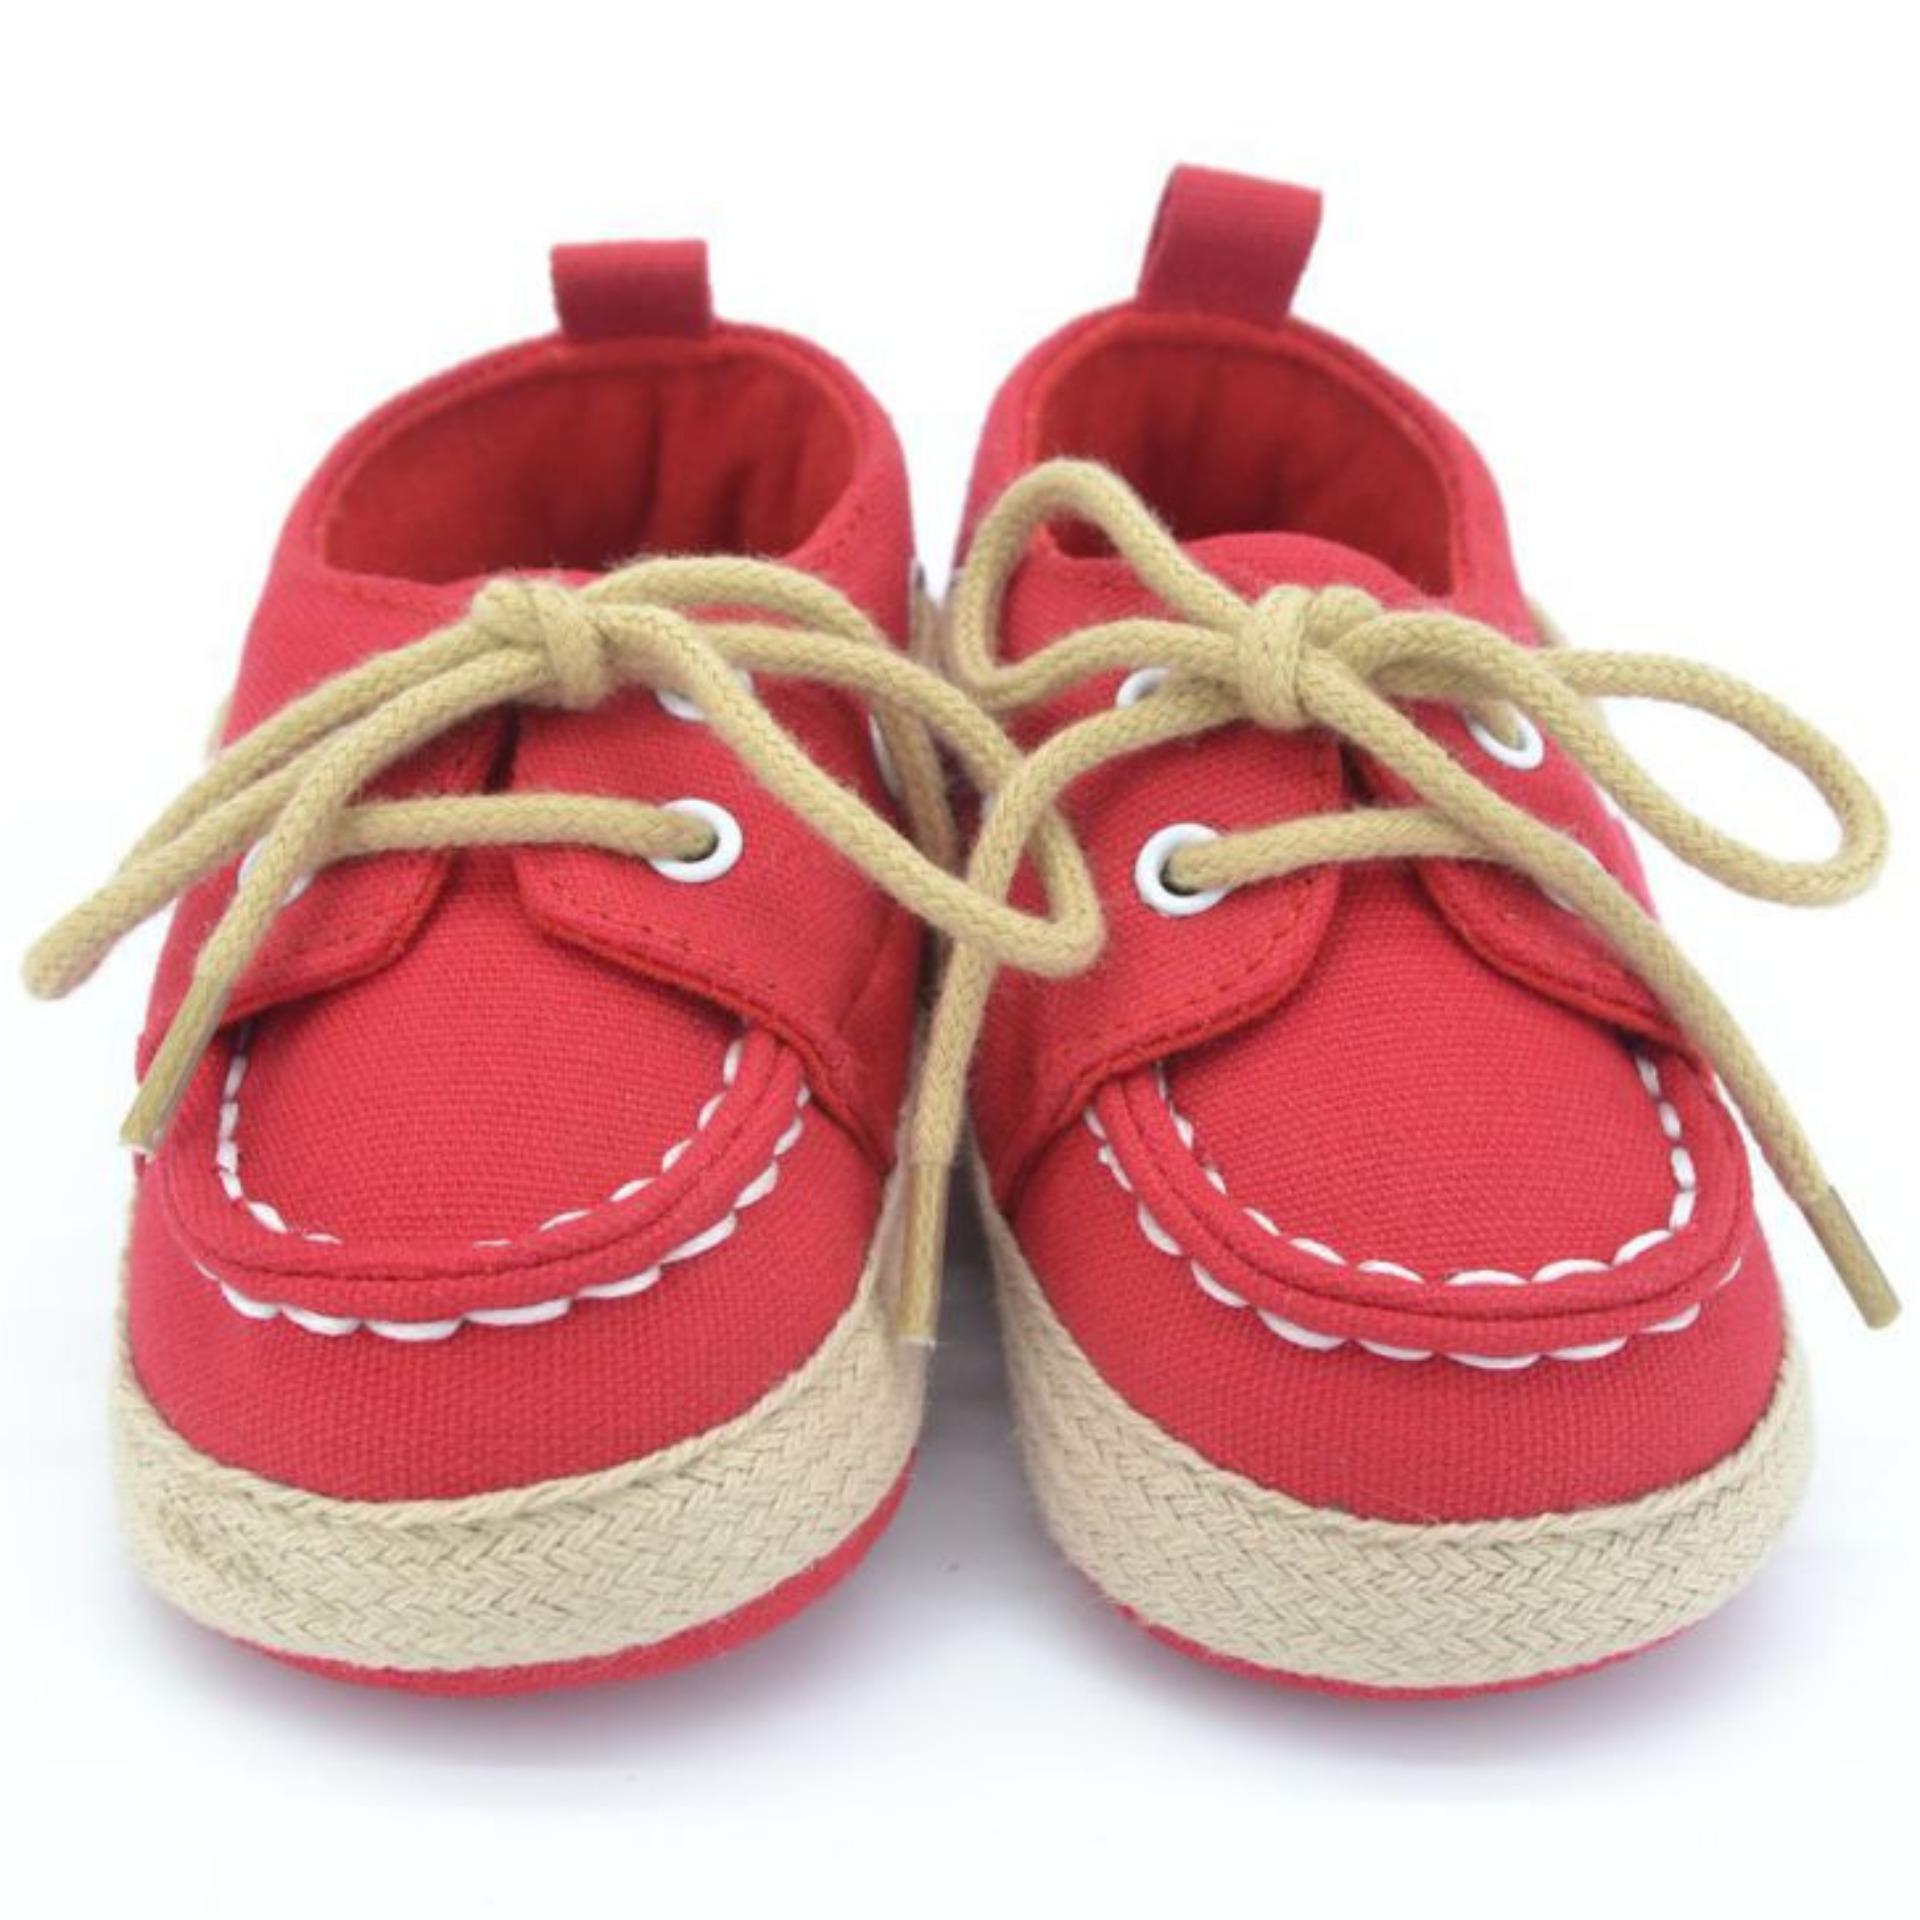 Ava Baby Prewalker Canvass Shoes Merah Sepatu Bayi Laki Laki Jawa Barat